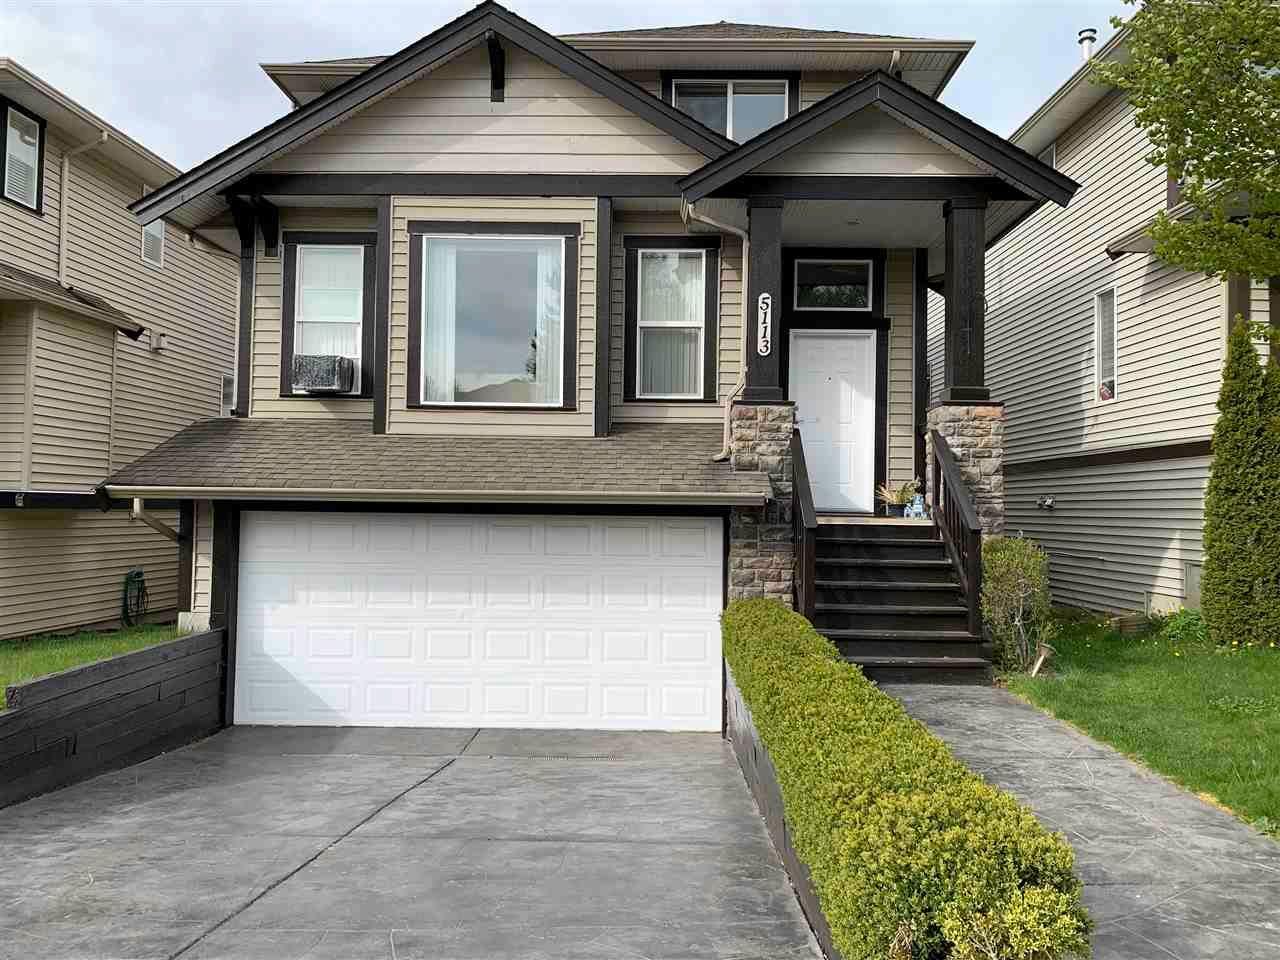 Main Photo: 5113 TESKEY Road in Chilliwack: Promontory House for sale (Sardis)  : MLS®# R2569532